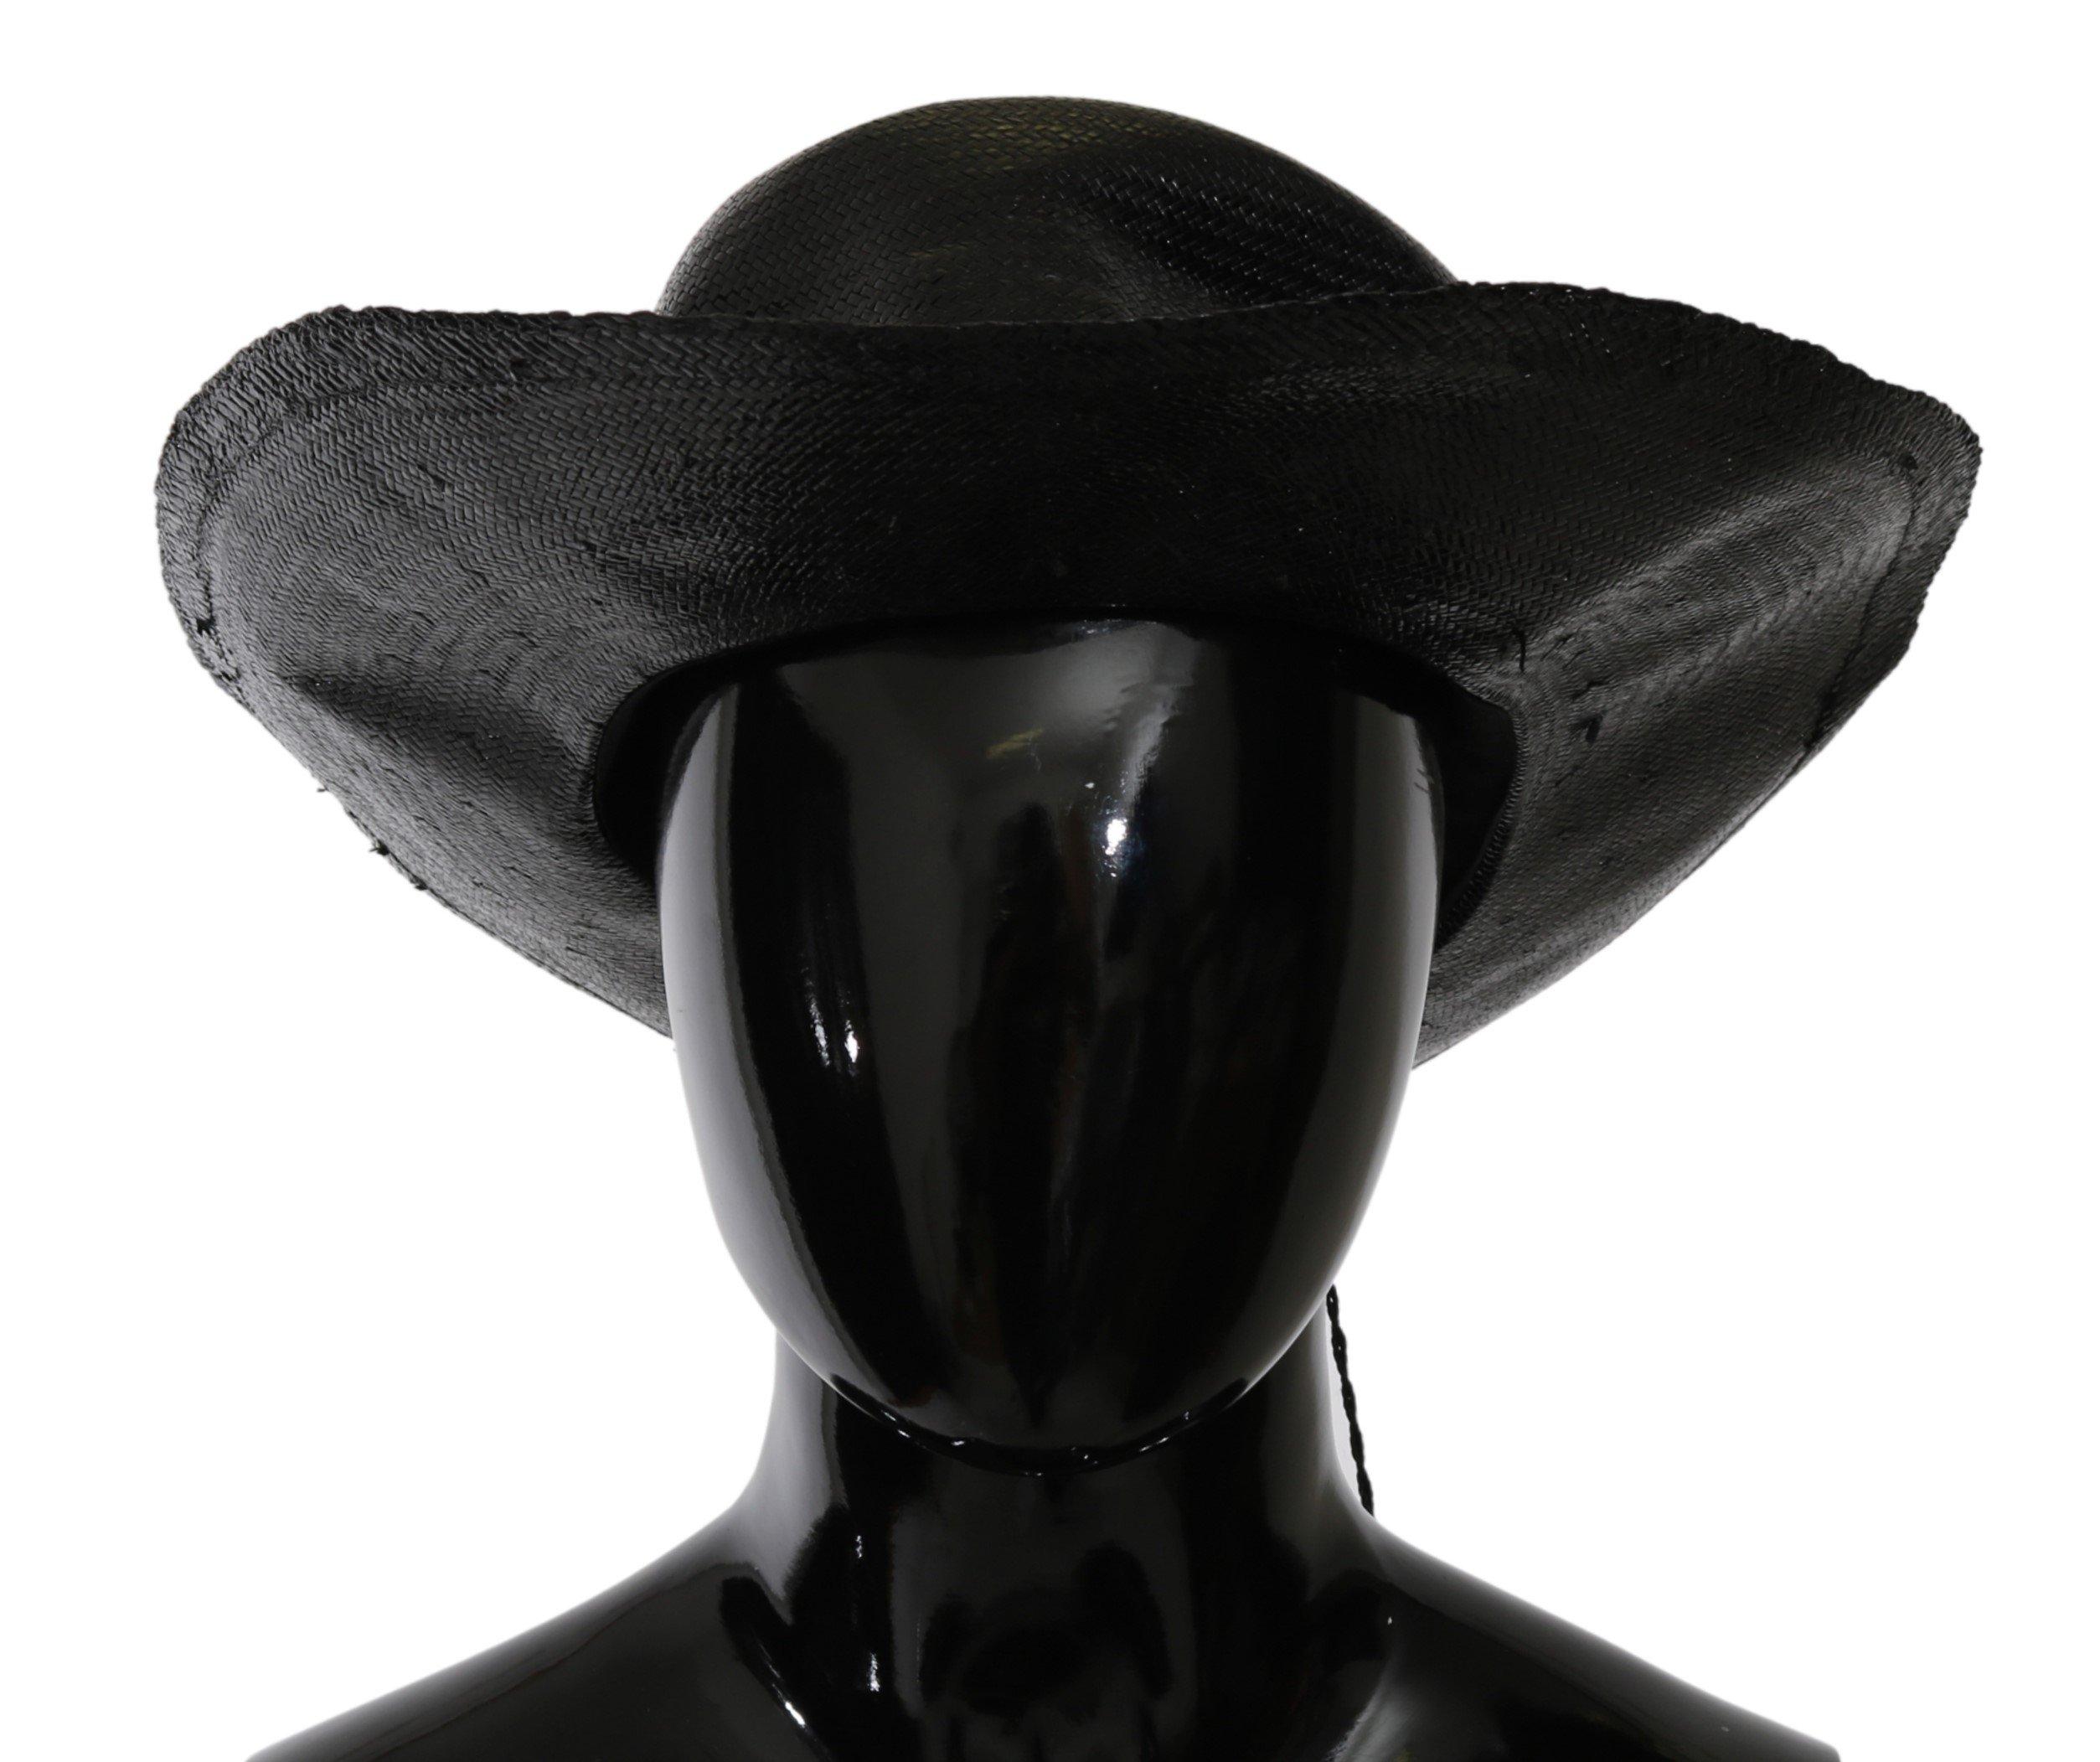 Costume National Women's Wide Brim Solid Hat Black HAT20018 - 58 cm|M